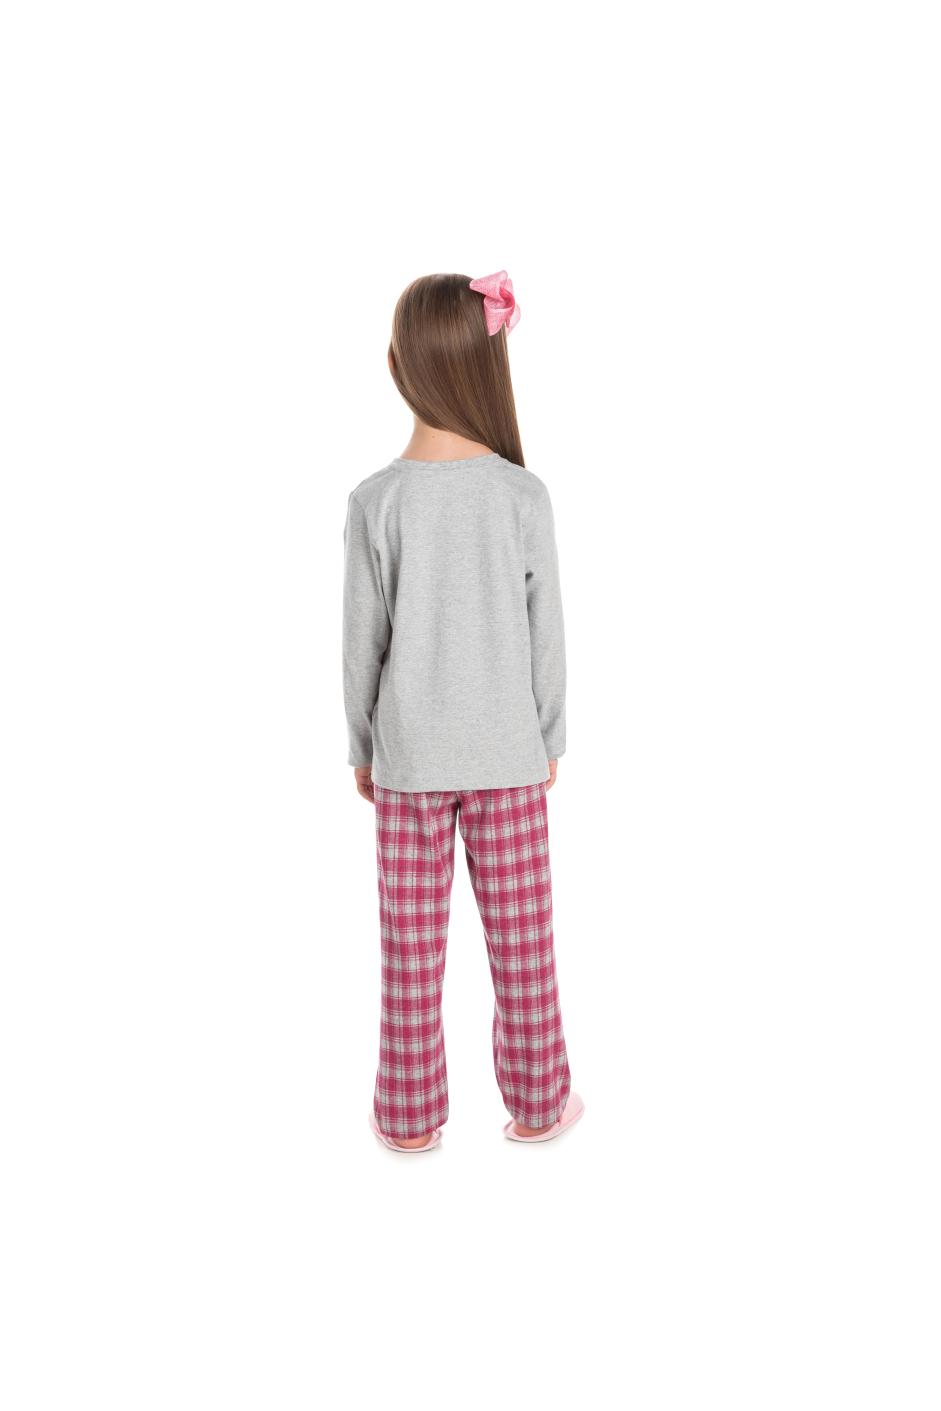 190/C - Pijama Infantil Feminino Xadrez Família Completa